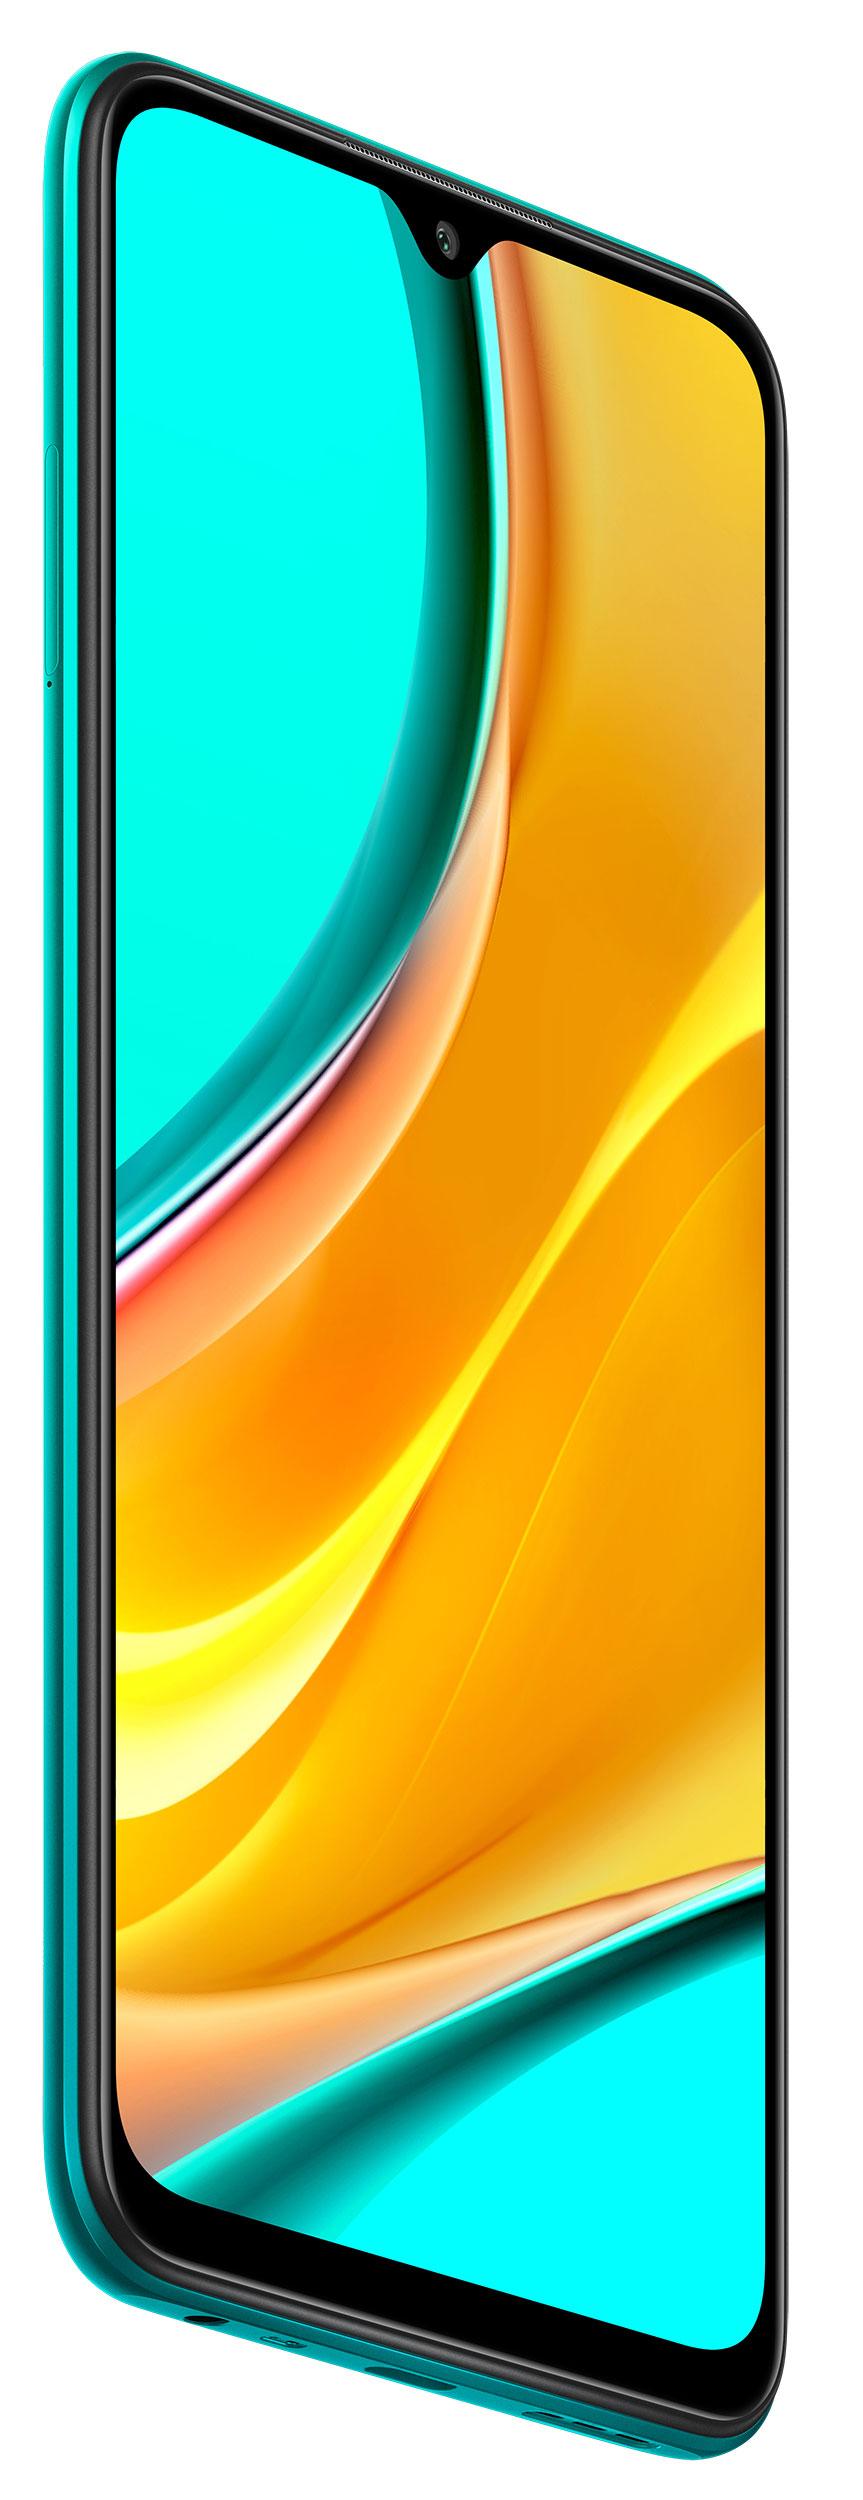 Redmi 9 okostelefon (Global) - 4+64GB, Óceánzöld